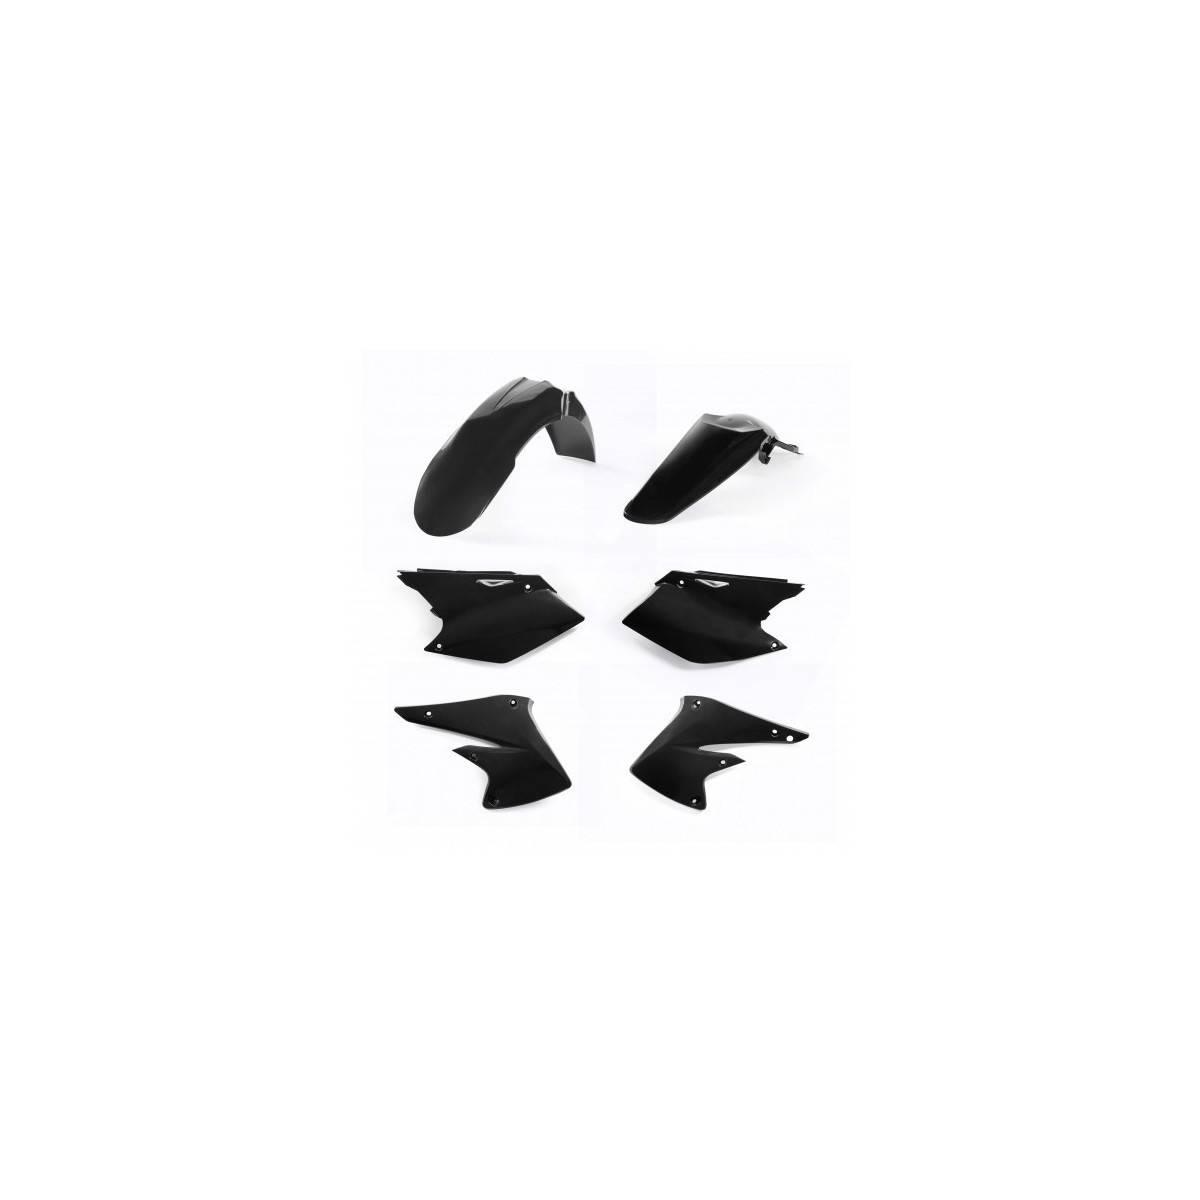 0007529-090 - Kit Plasticos Crf125 02 03 Crf250 02 03 Negro